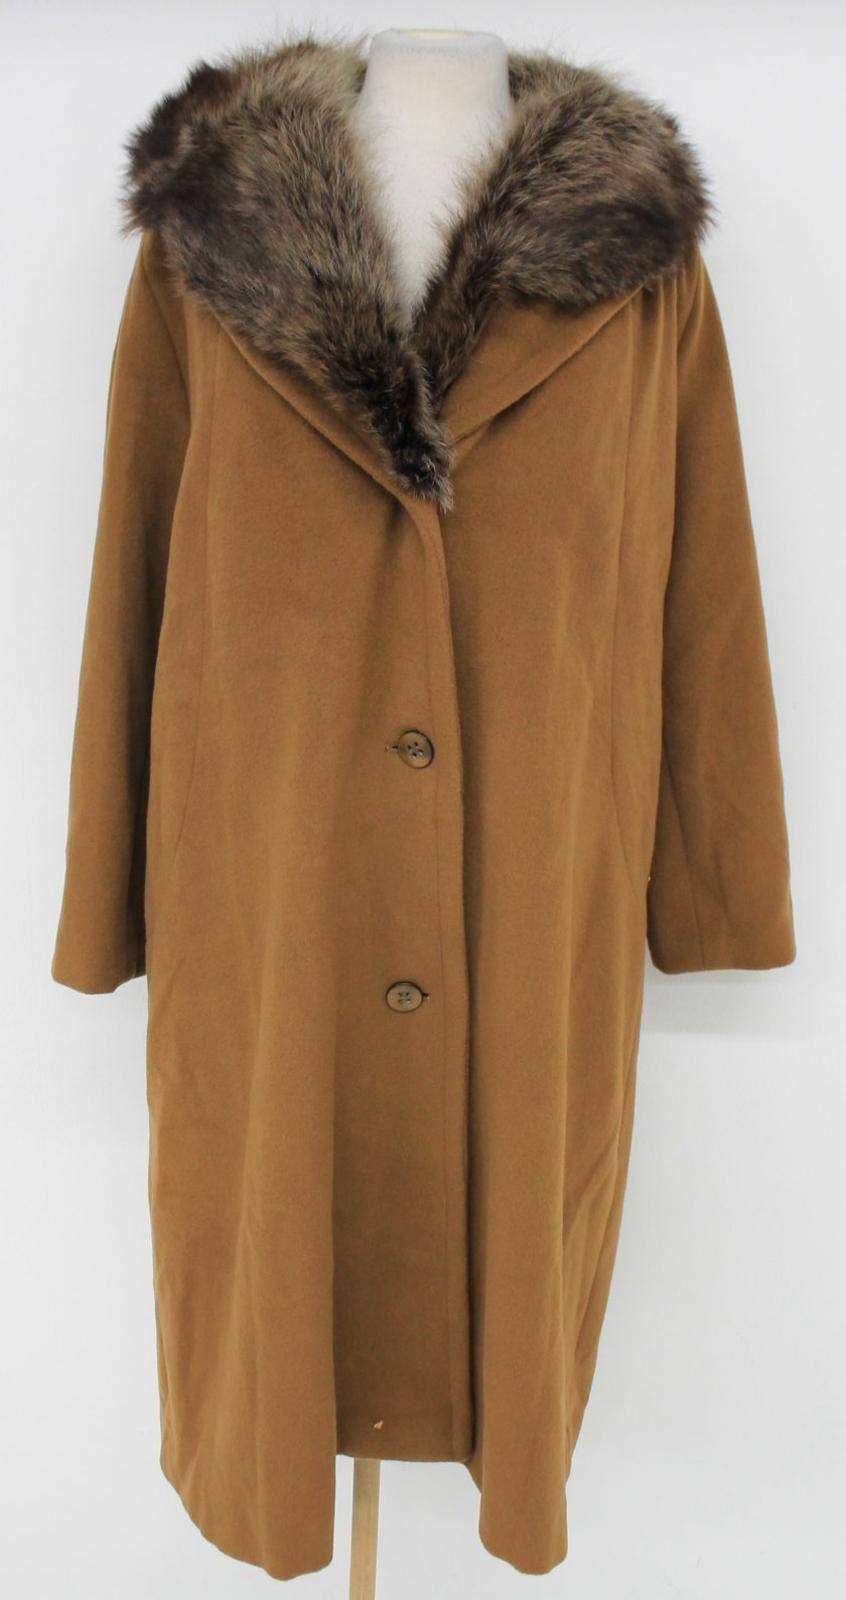 Veste en cuir camel stradivarius